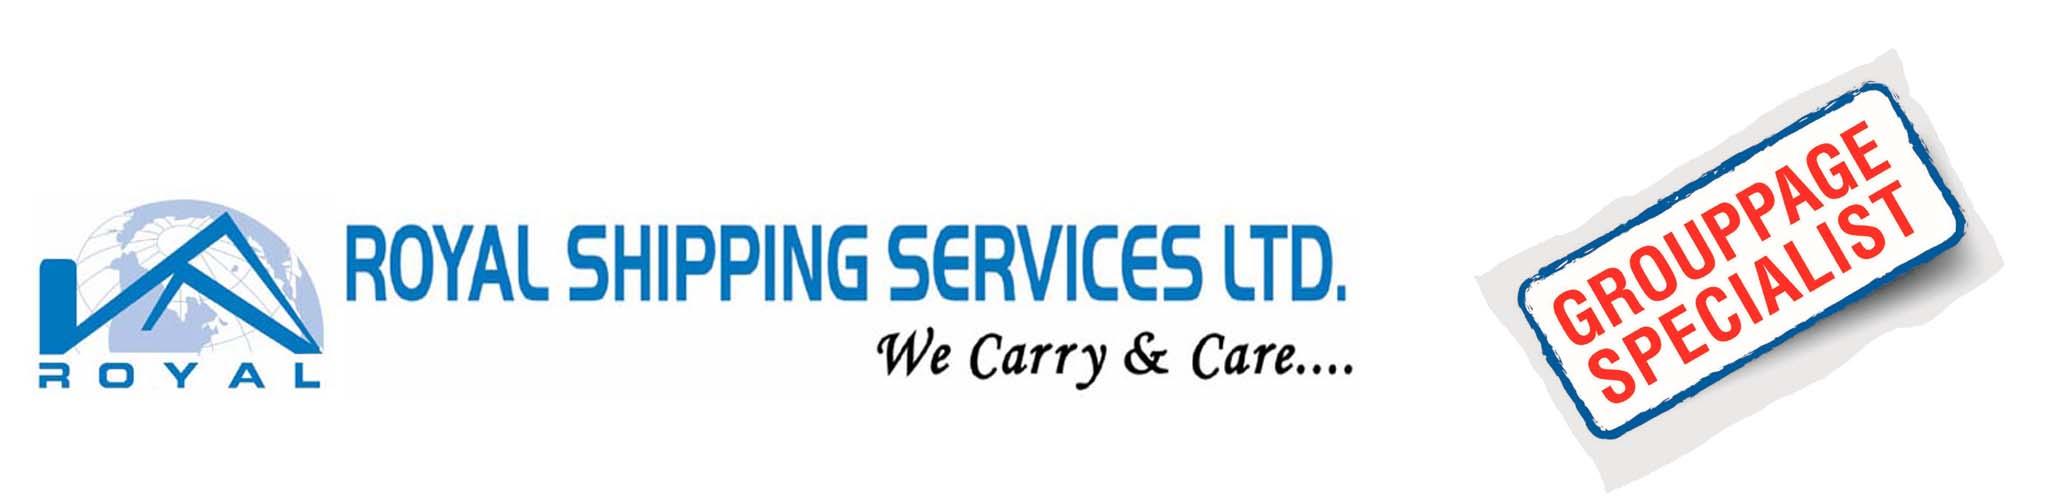 Royal Shipping Services LTD.